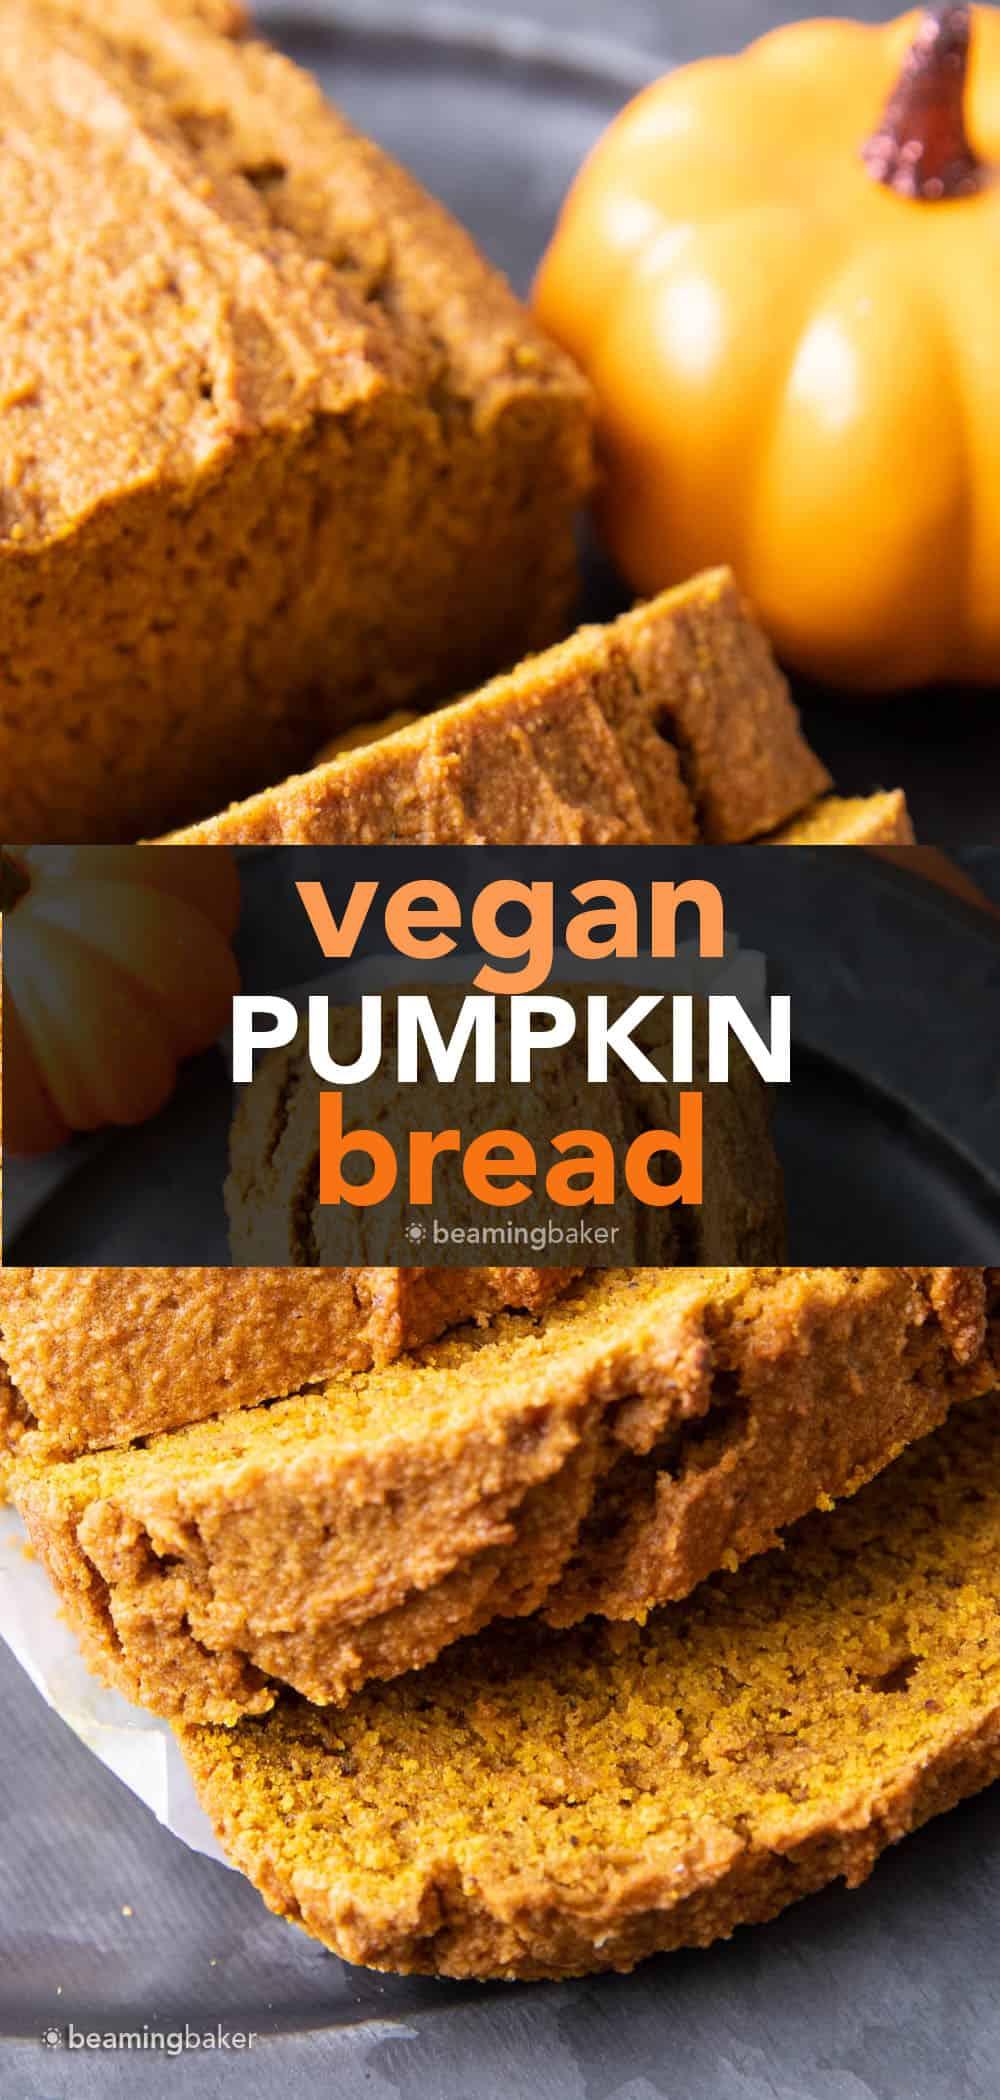 Easy Vegan Pumpkin Bread: this vegan pumpkin bread recipe is moist, deliciously dense & lightly fluffy, with rich pumpkin flavor. The best vegan pumpkin bread! #Vegan #Pumpkin #Bread #Easy | Recipe at BeamingBaker.com